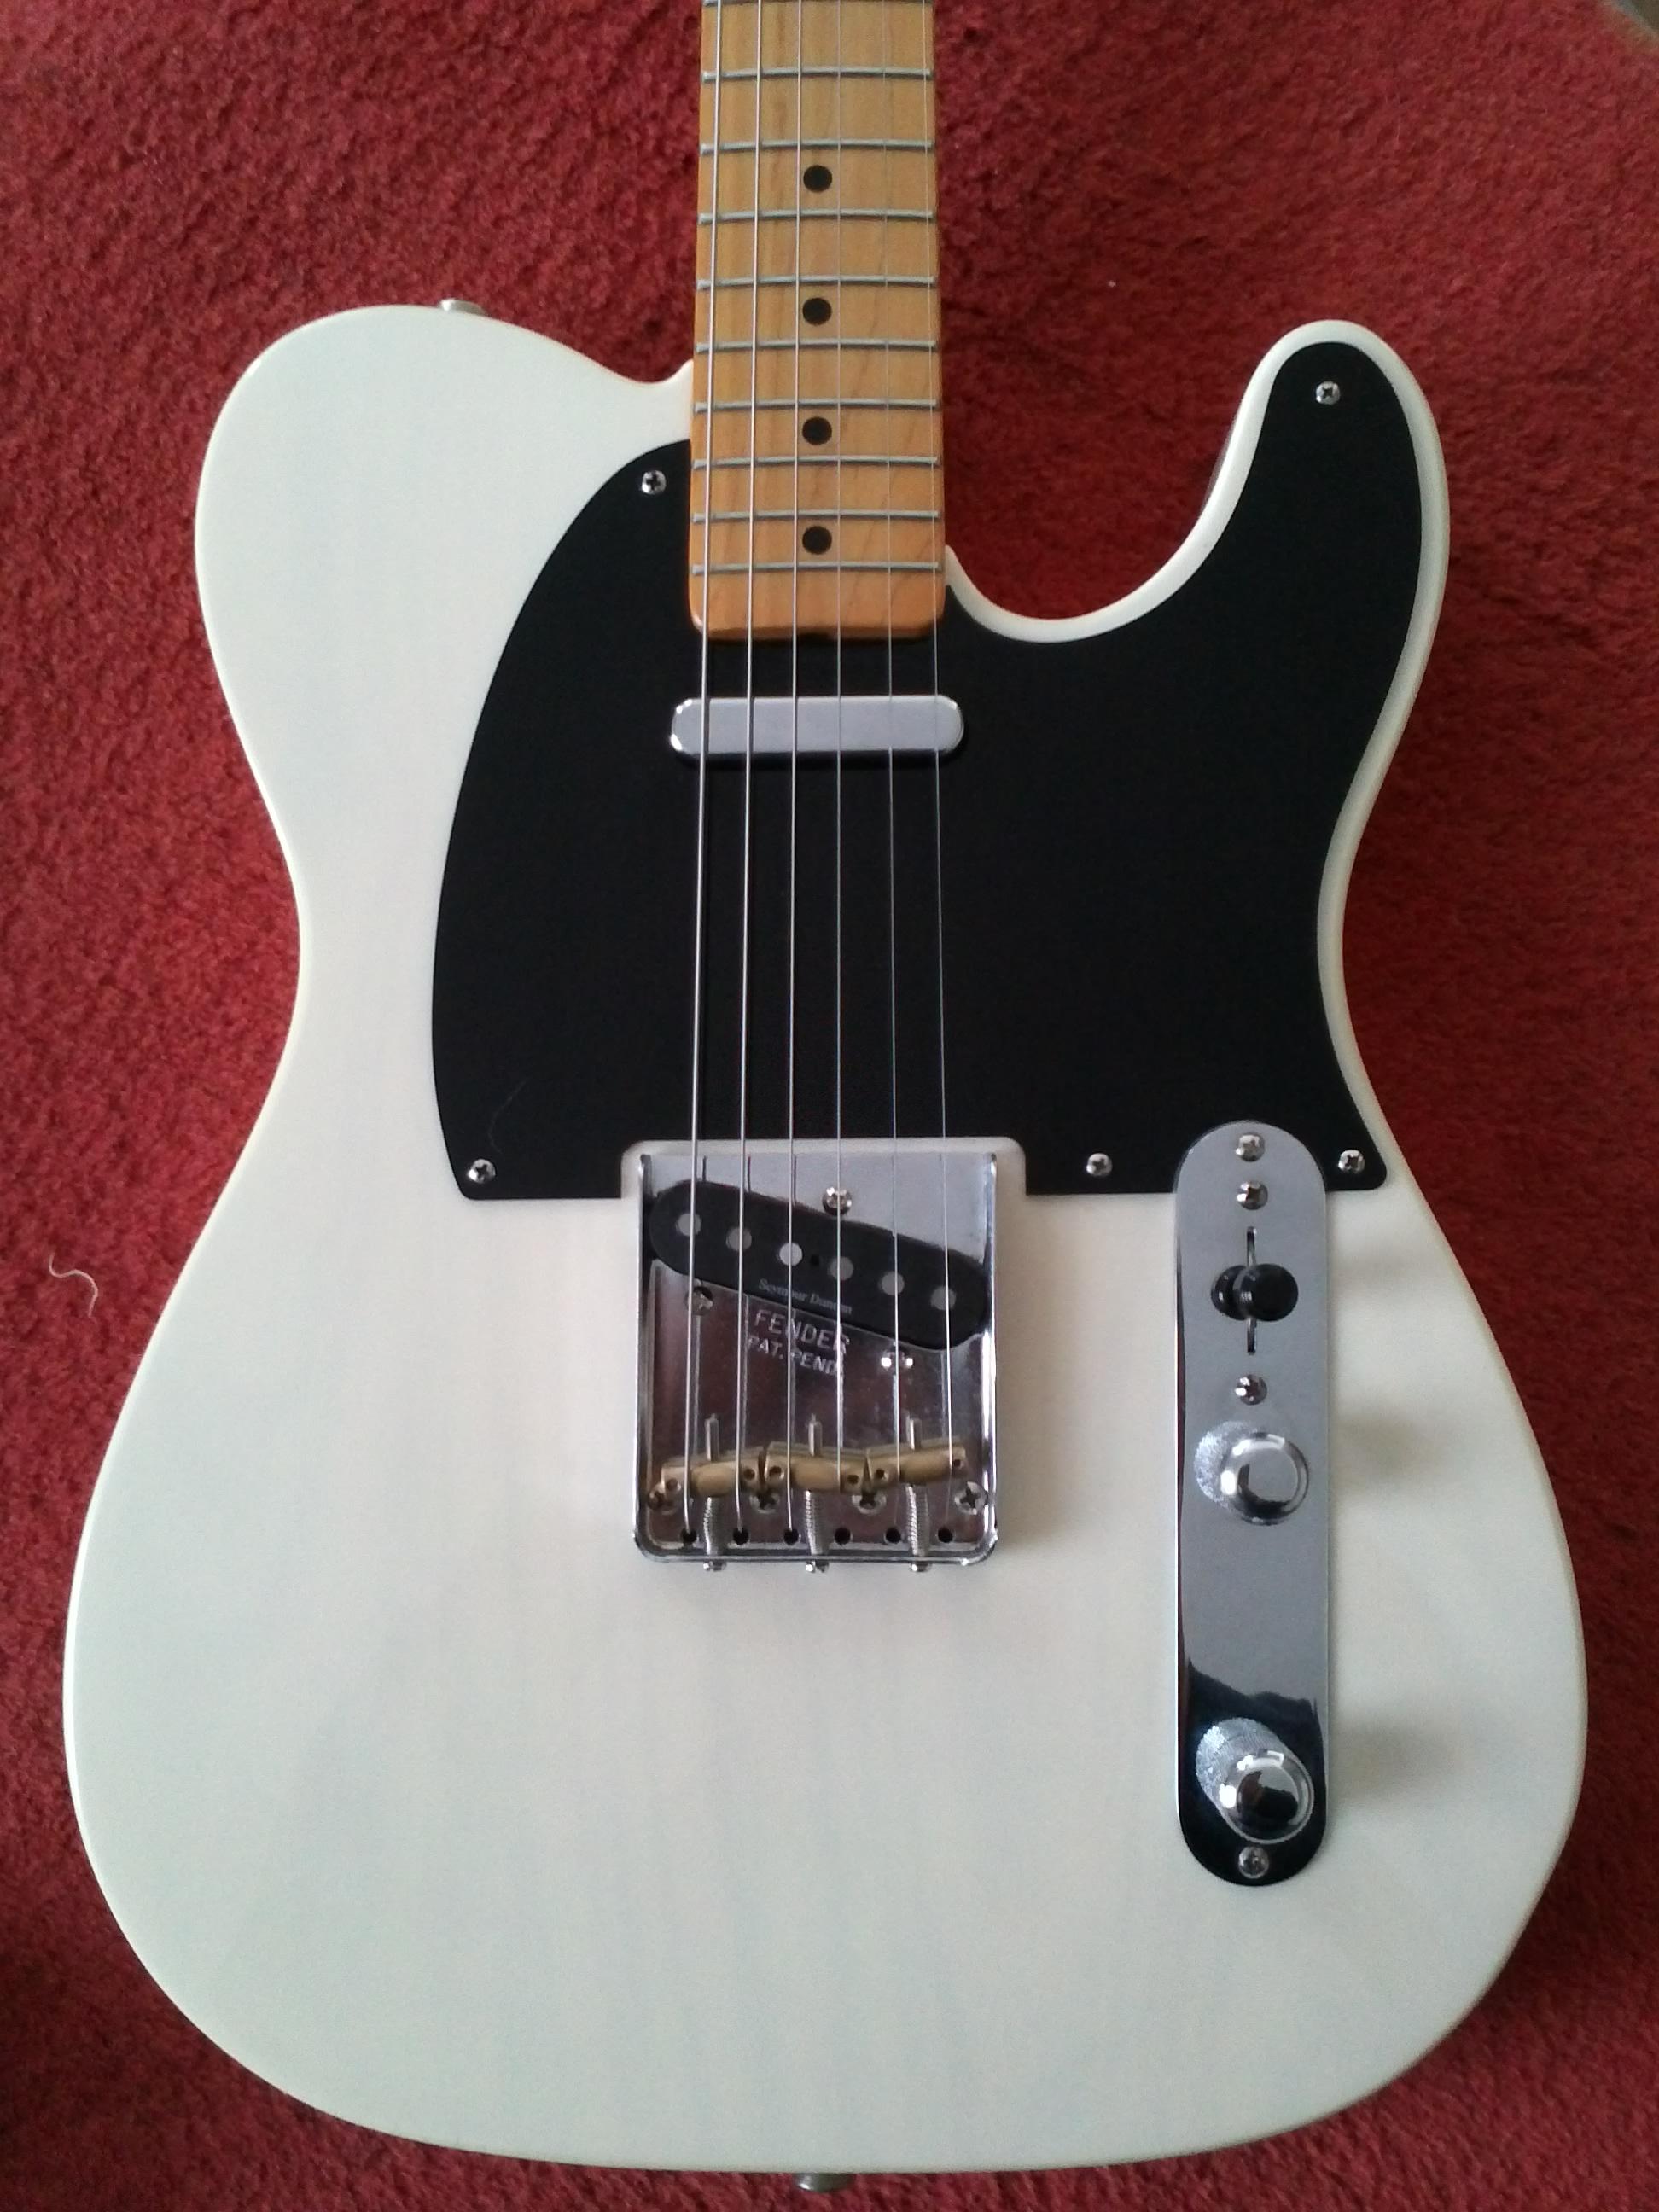 fender classic 50 39 s telecaster white blond image 388333 audiofanzine. Black Bedroom Furniture Sets. Home Design Ideas